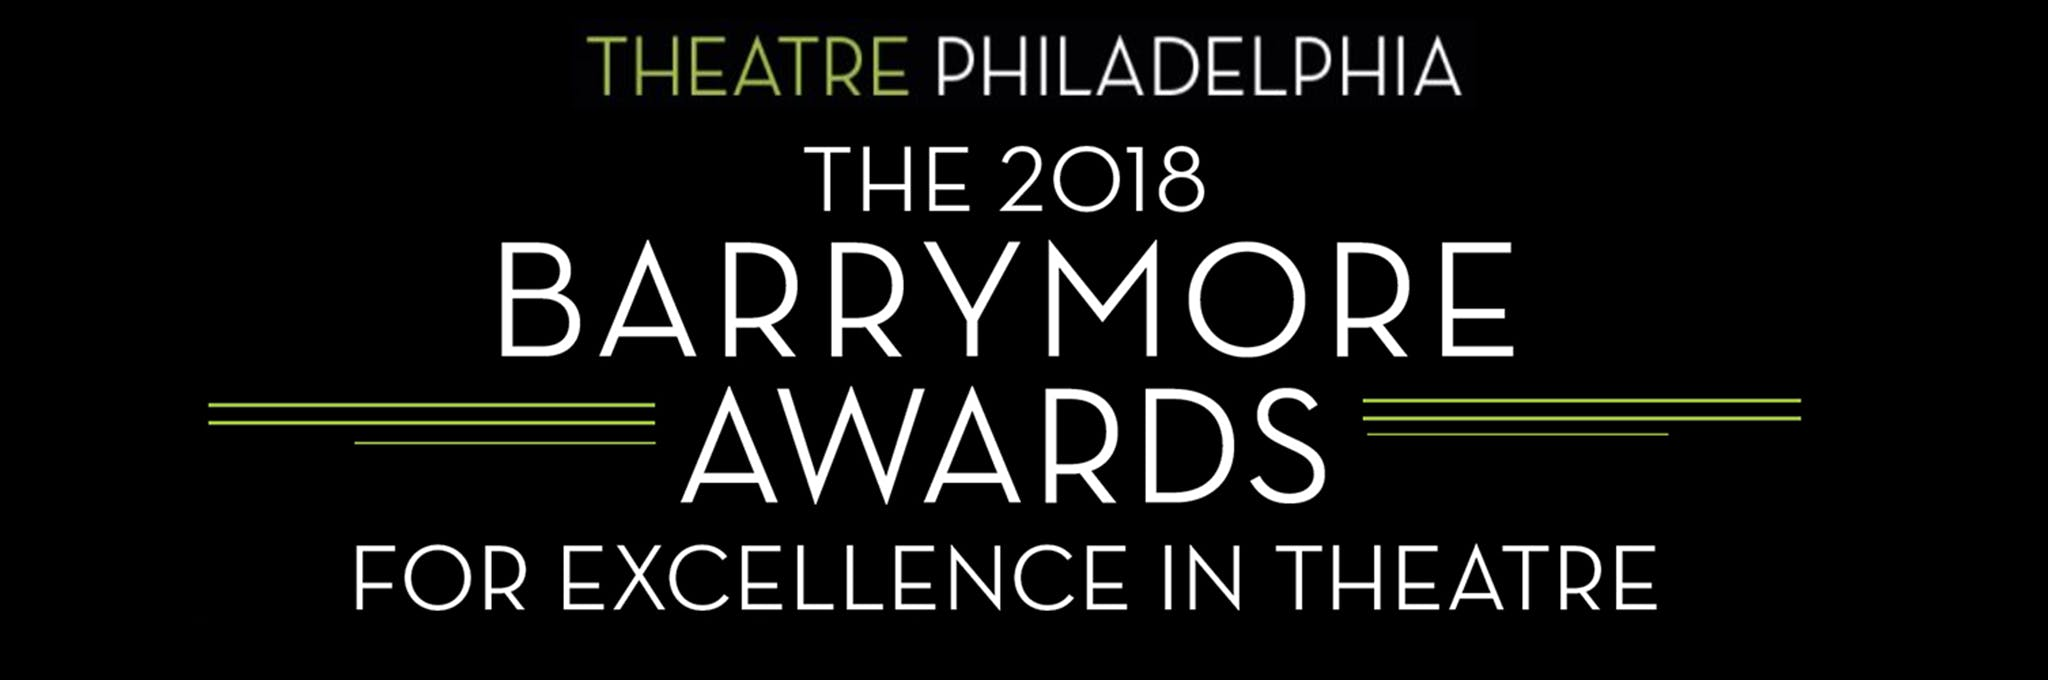 The 2018 Barrymore Awards Logo